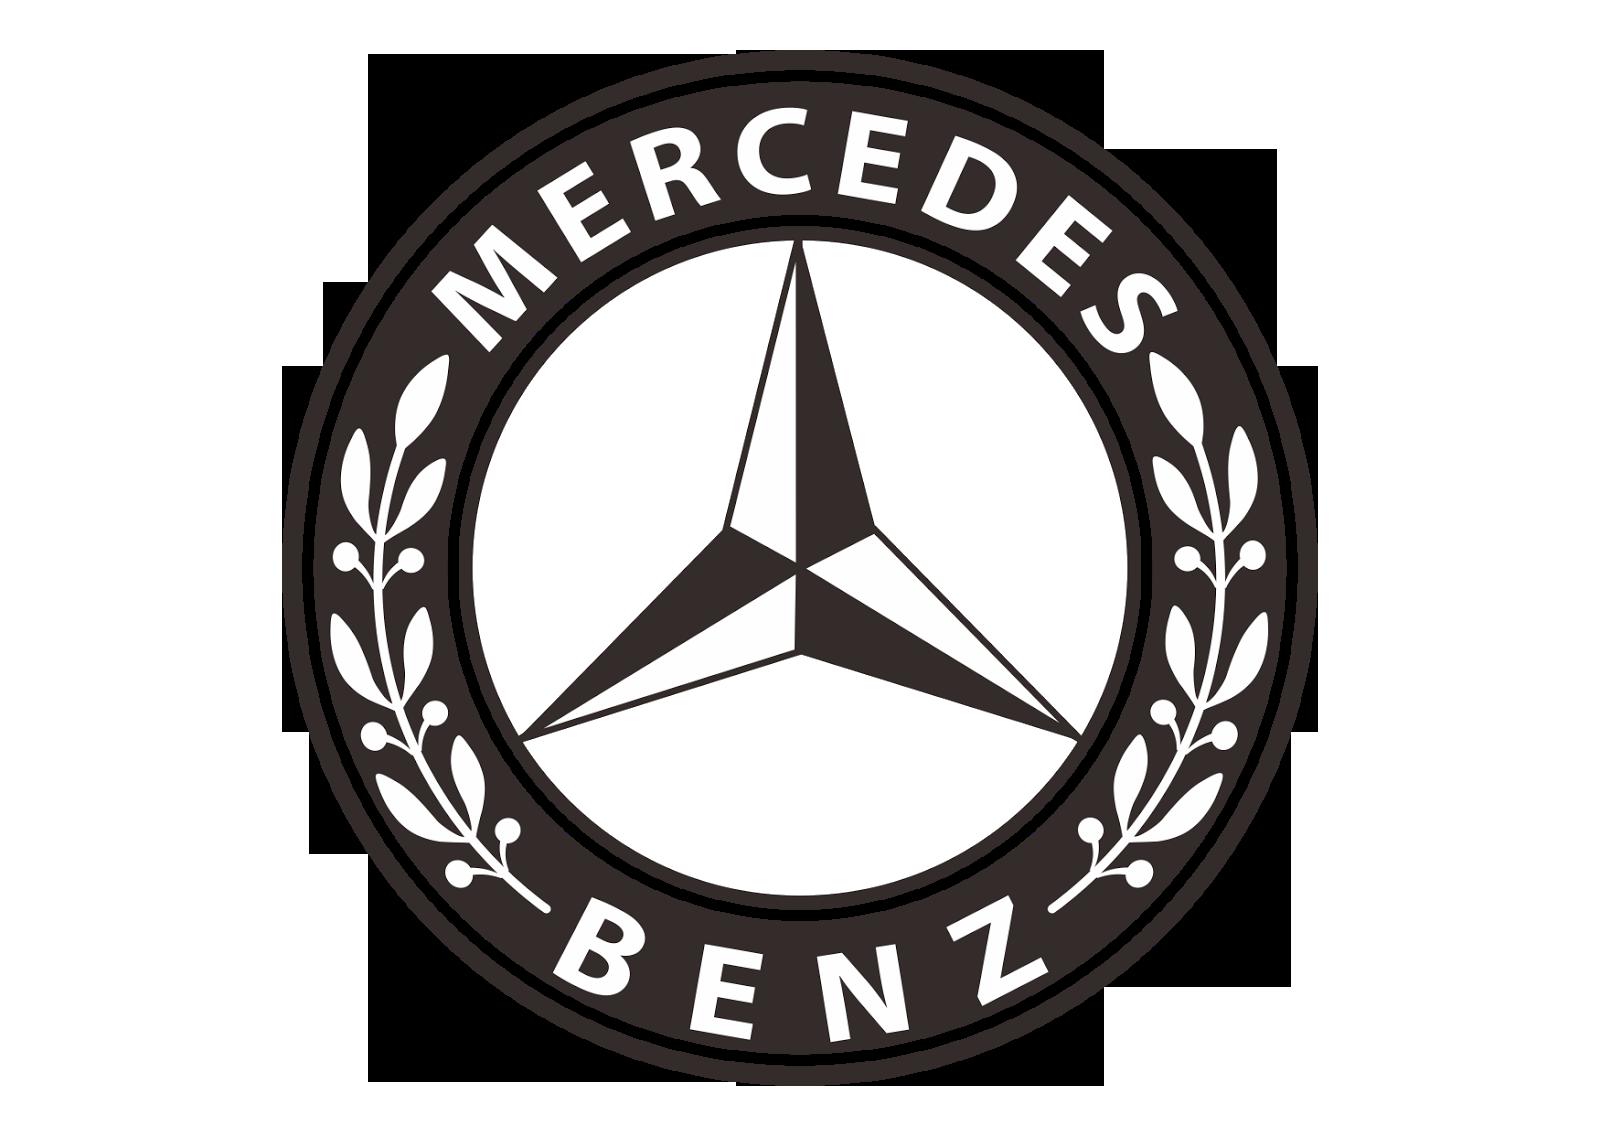 Logo mercedes clipart svg transparent Download Mercedes-Benz Logo Clipart HQ PNG Image | FreePNGImg svg transparent